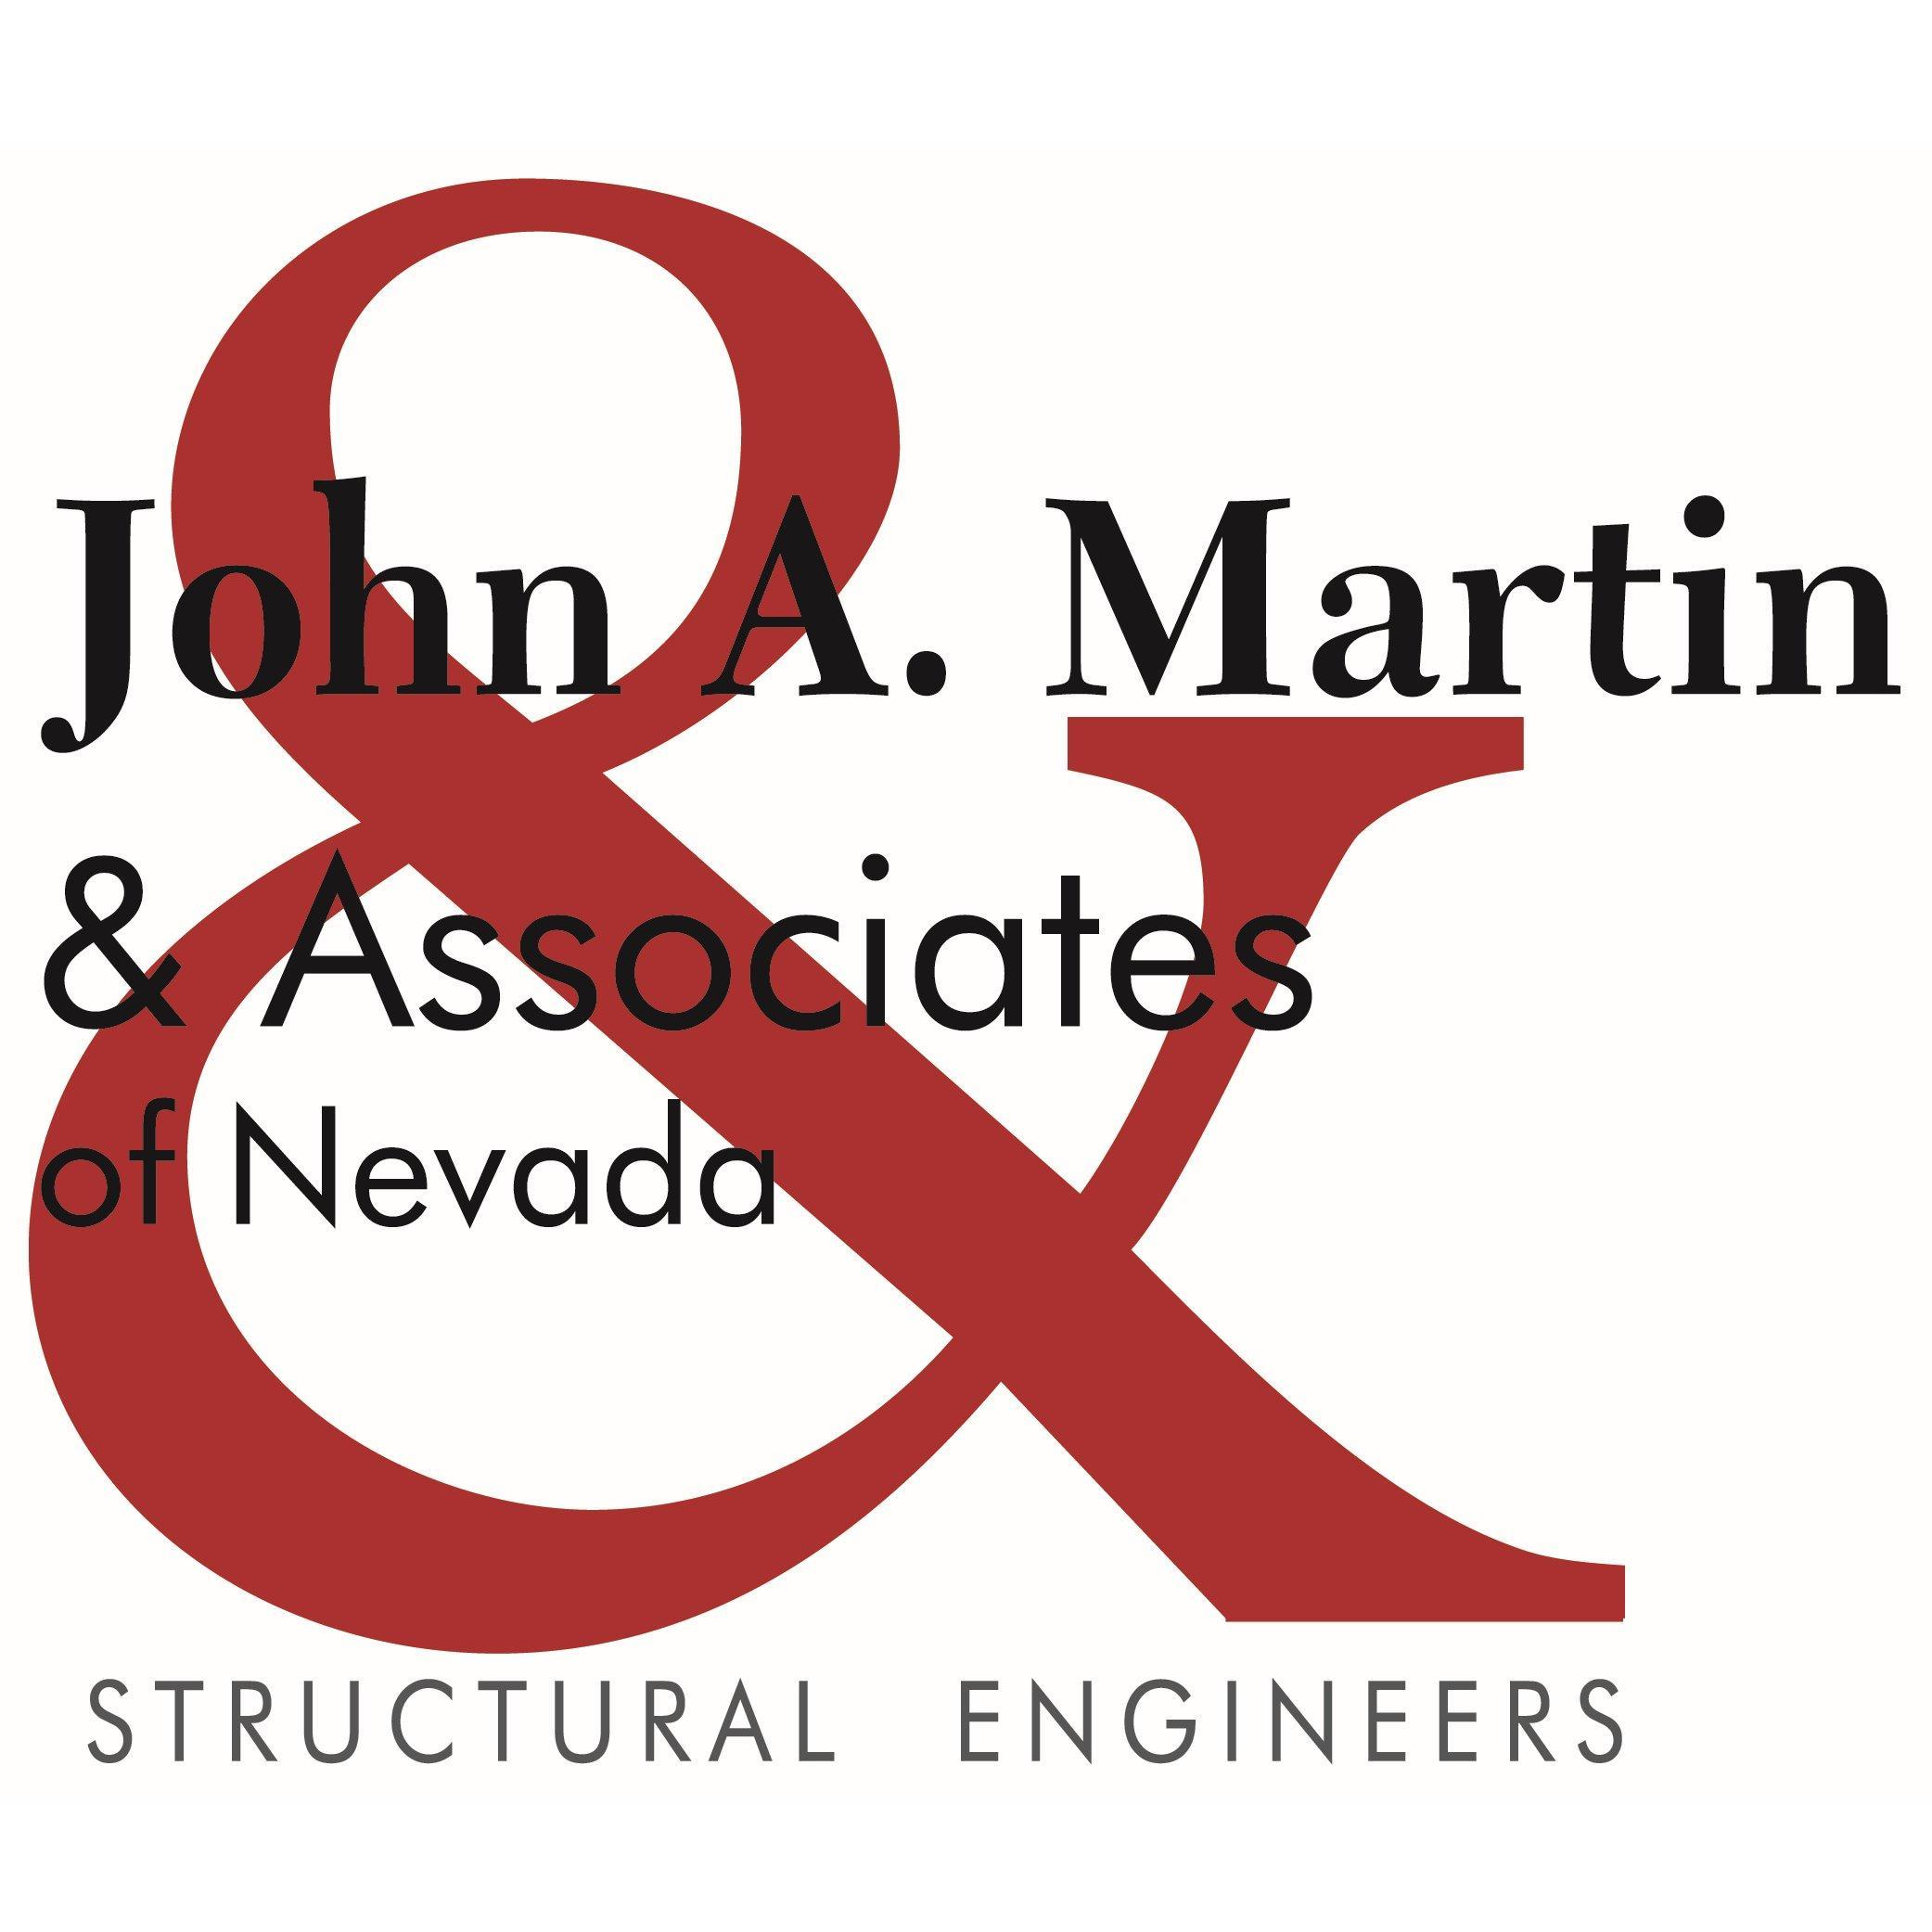 John A Martin & Associates of Nevada